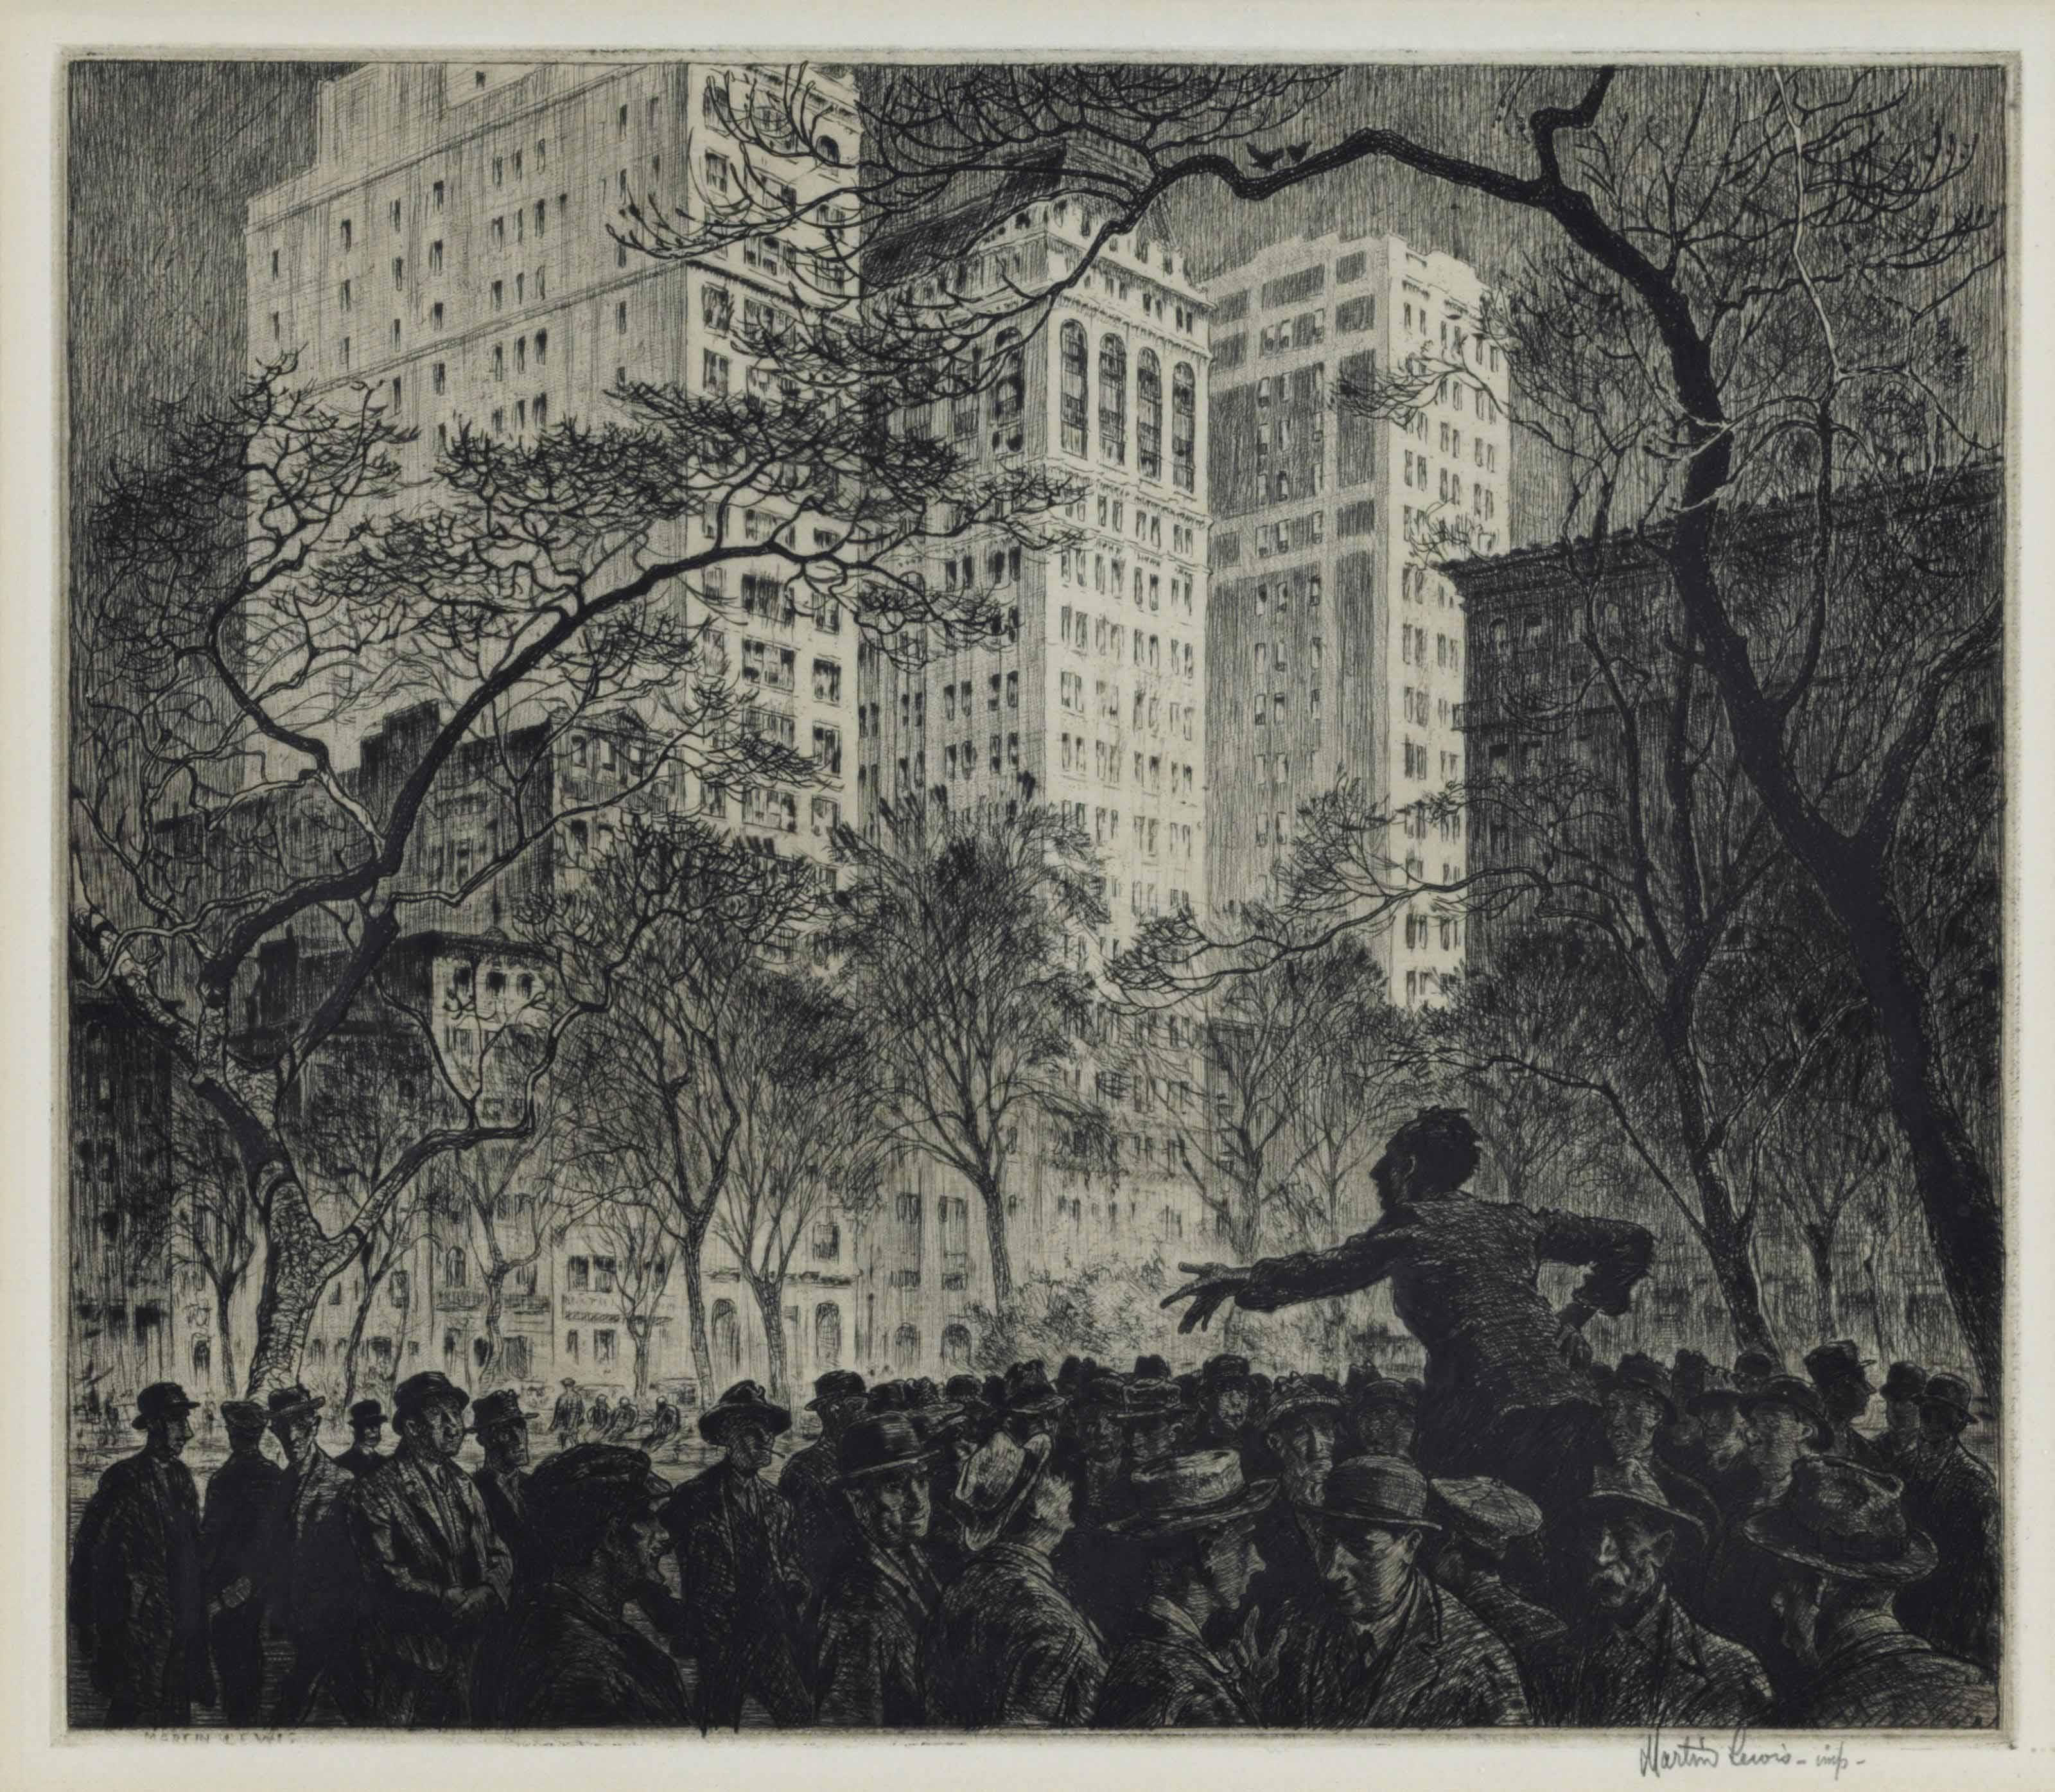 The Orator, Madison Square